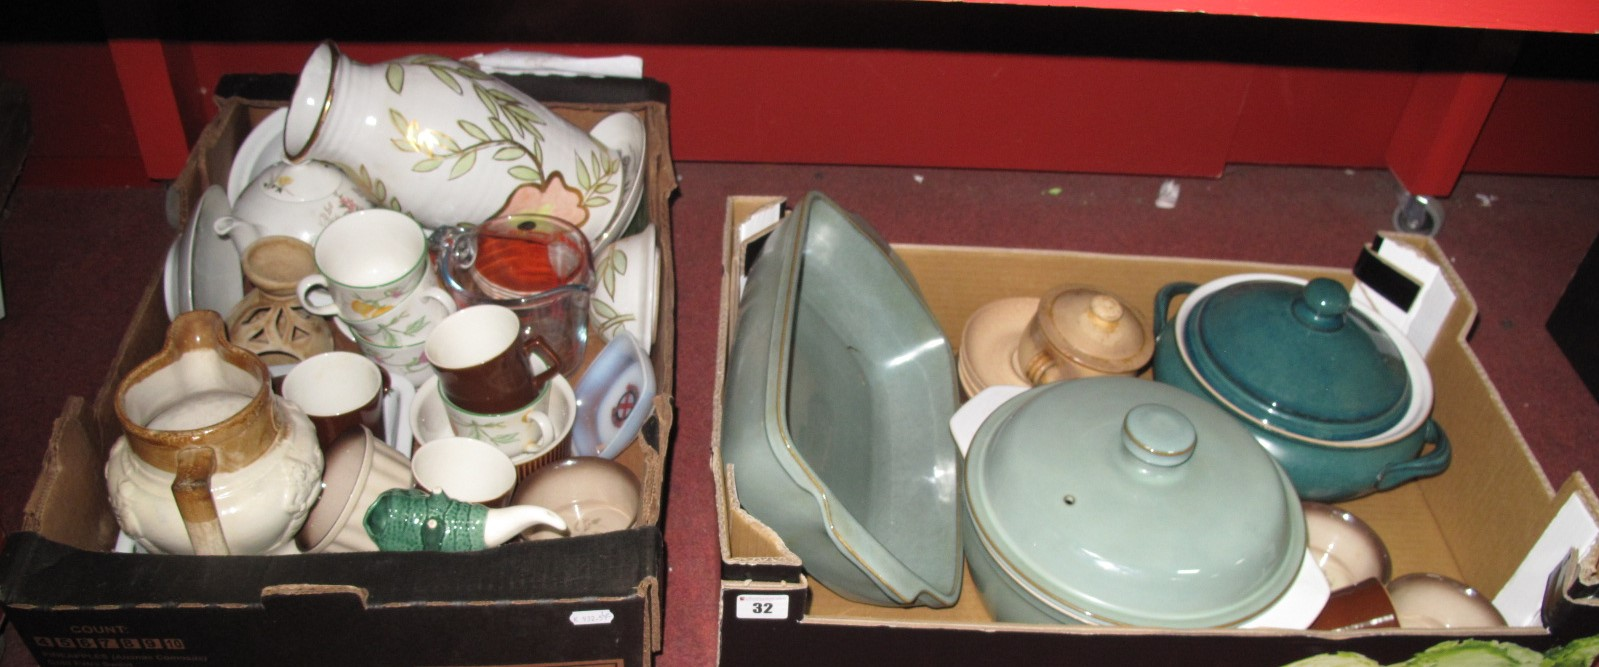 Lot 32 - Denby Ware Tureens, XIX Century Jug, (damage), Ridgeway teapot, etc:- Two Boxes